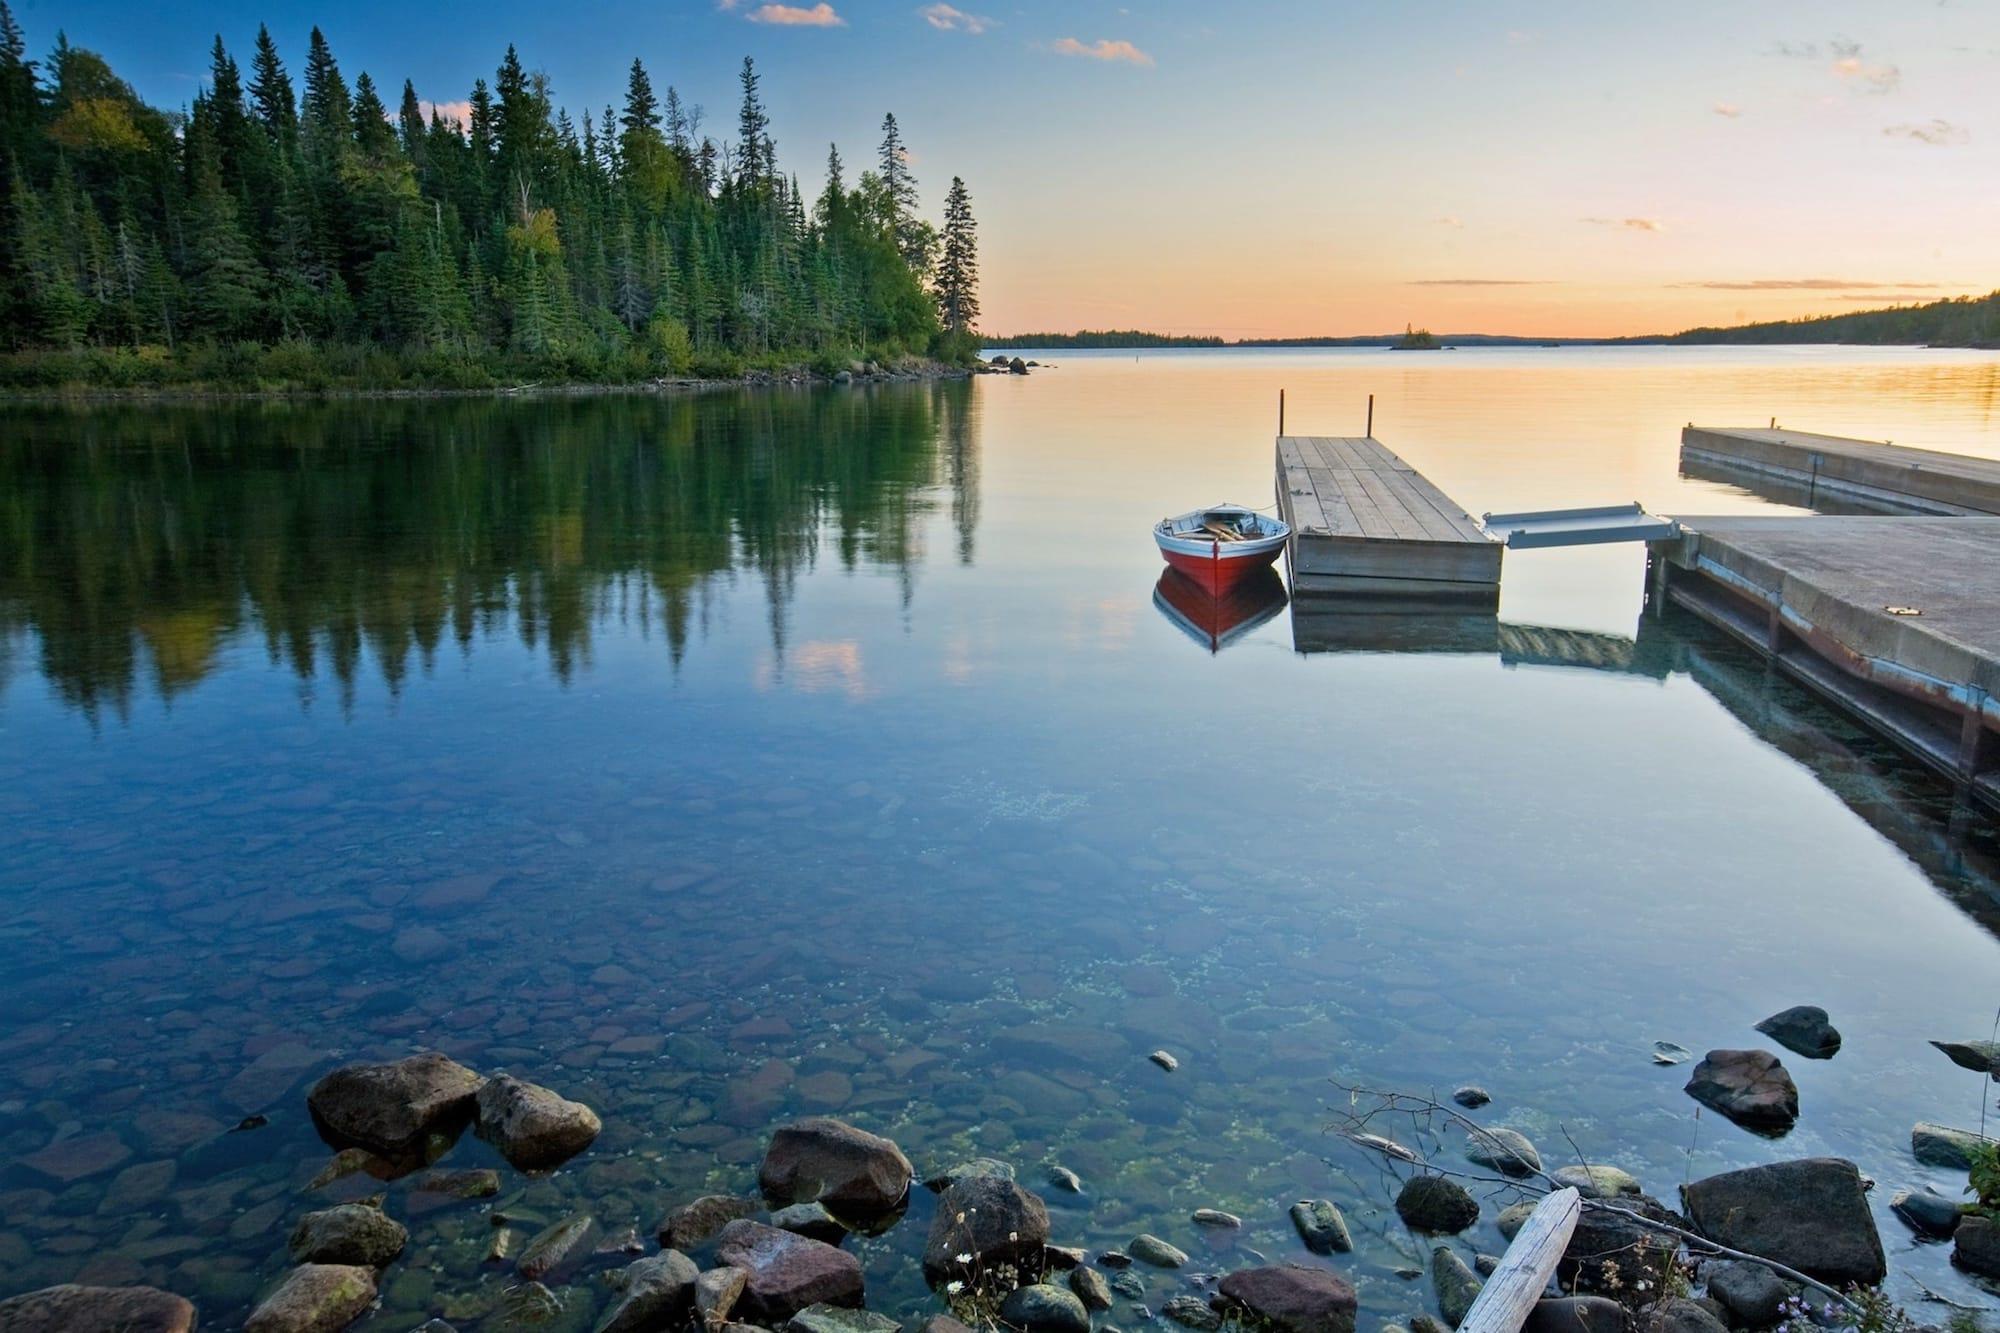 Isle Royal National Park // our adventure bucketlist for 2019